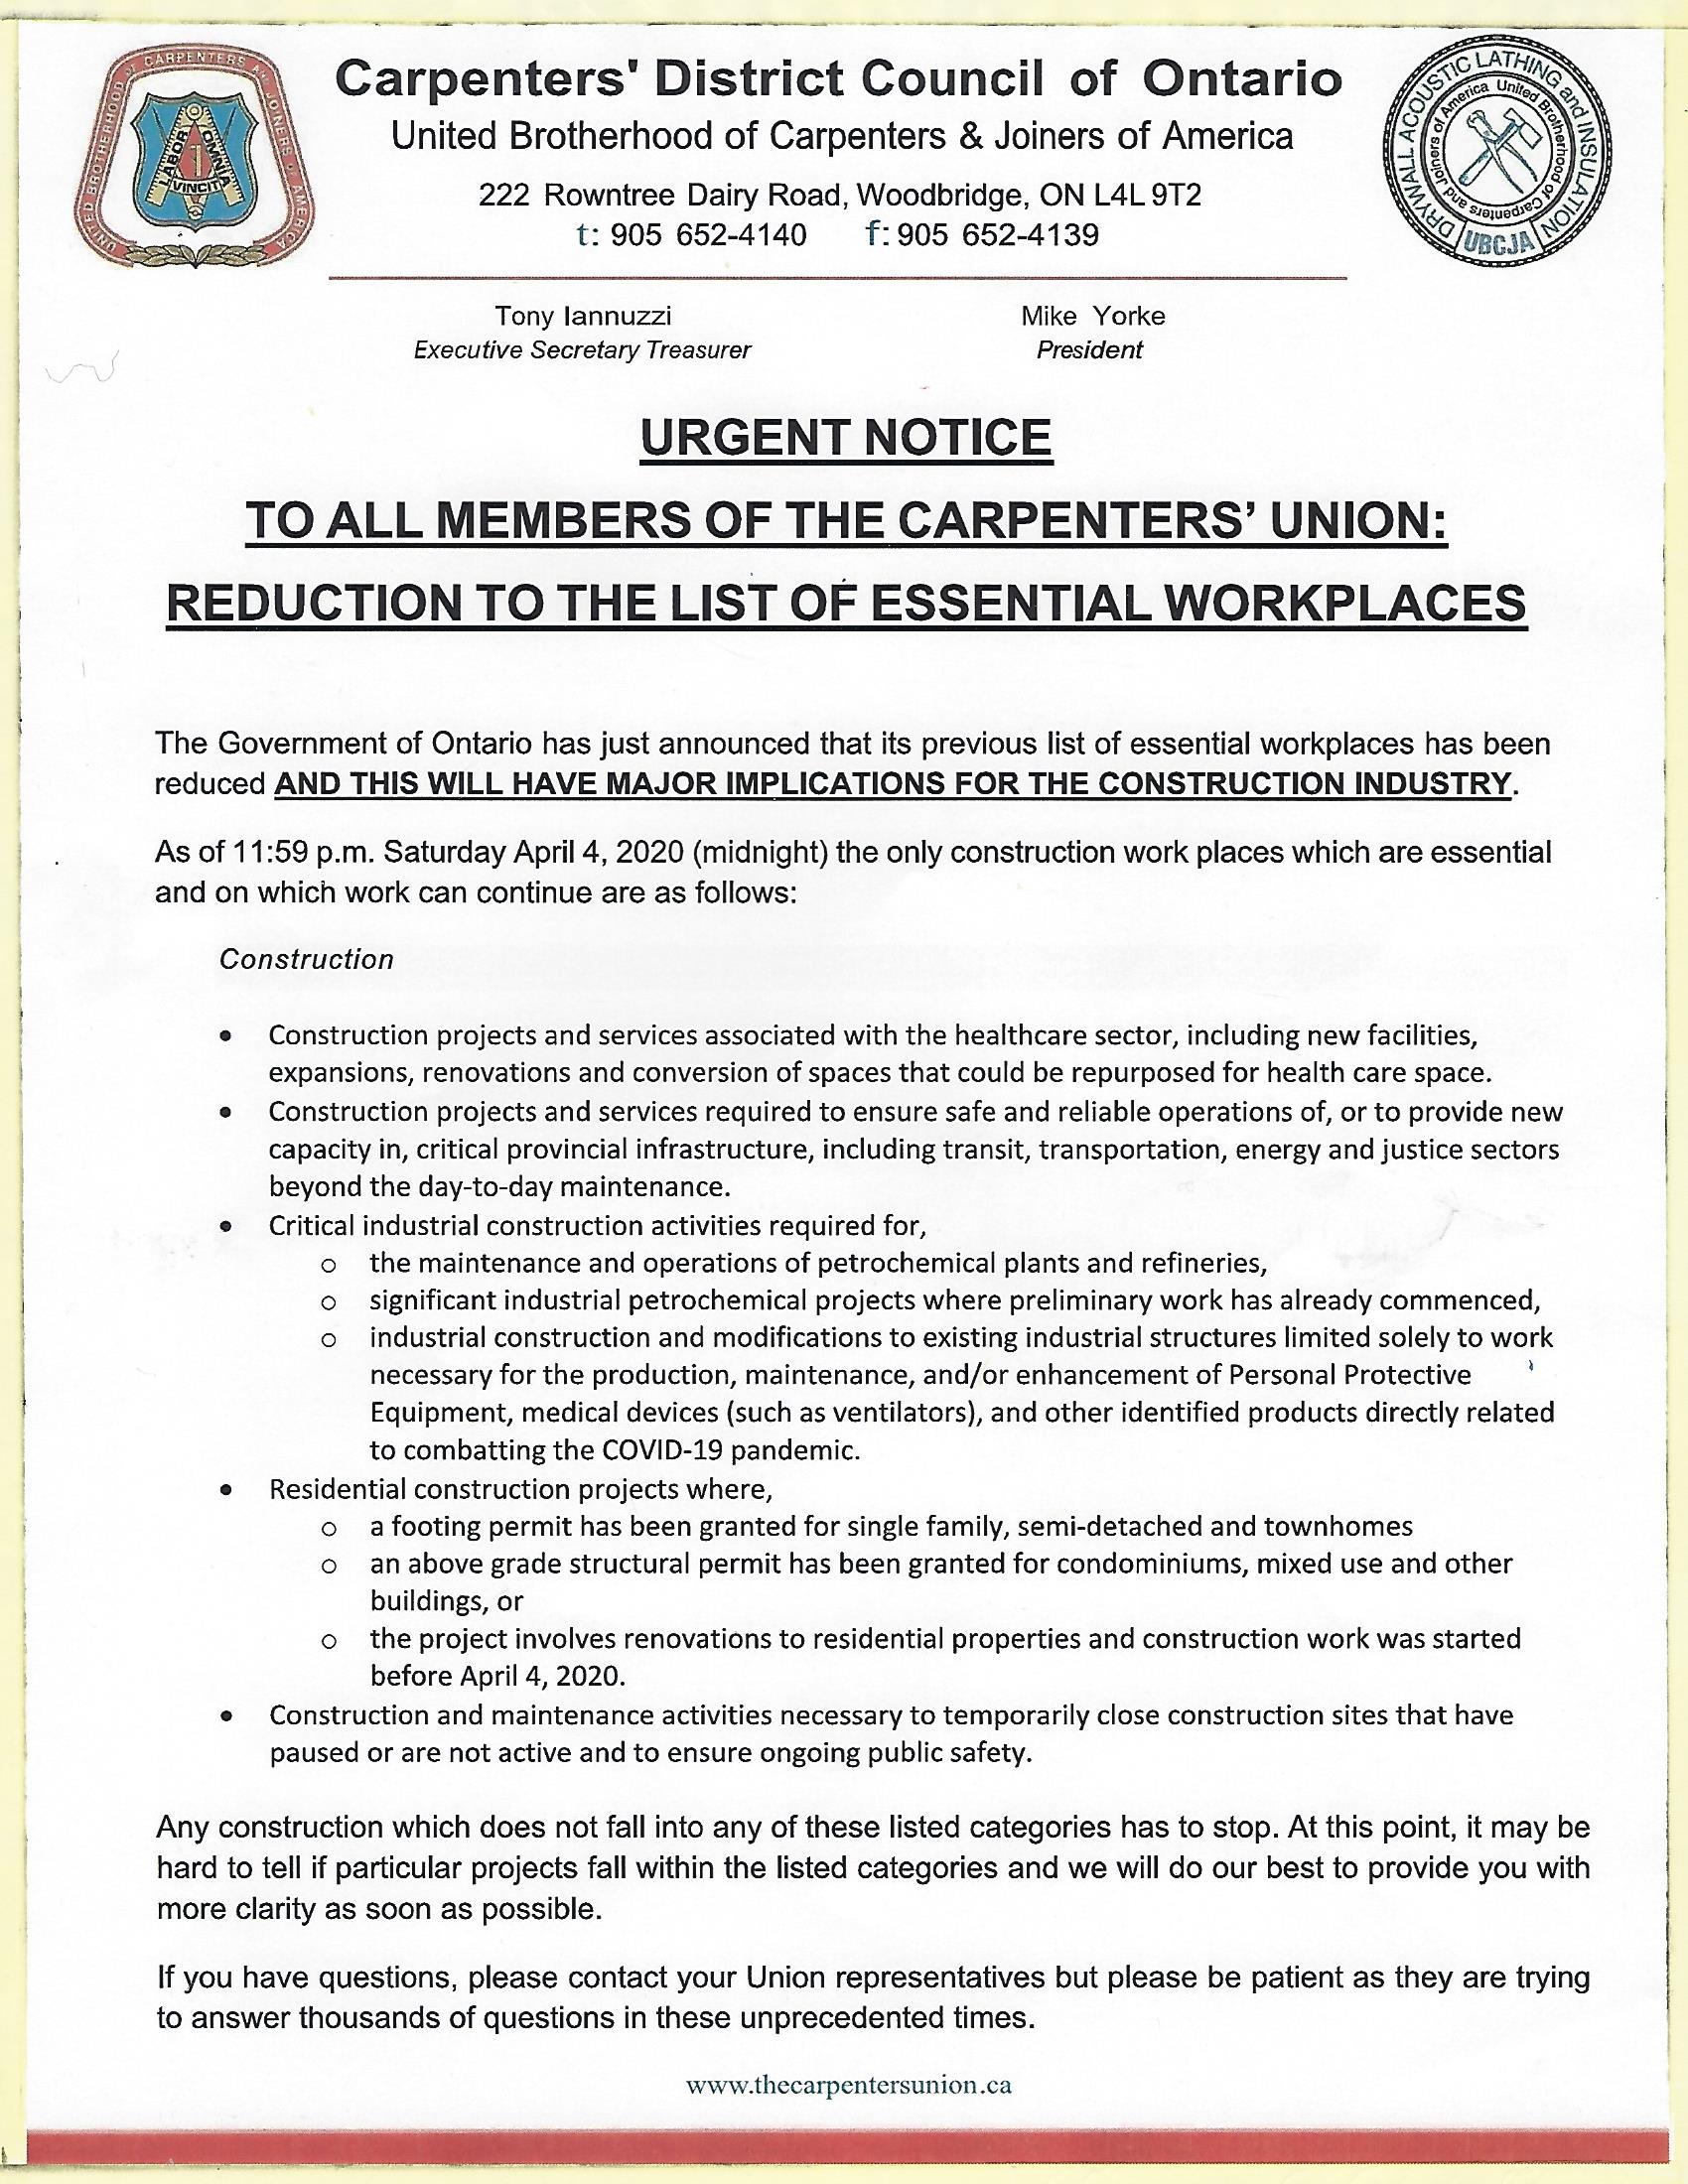 2020.04.03-Urgent_Notice_Revised_Essential_Workplaces.jpg